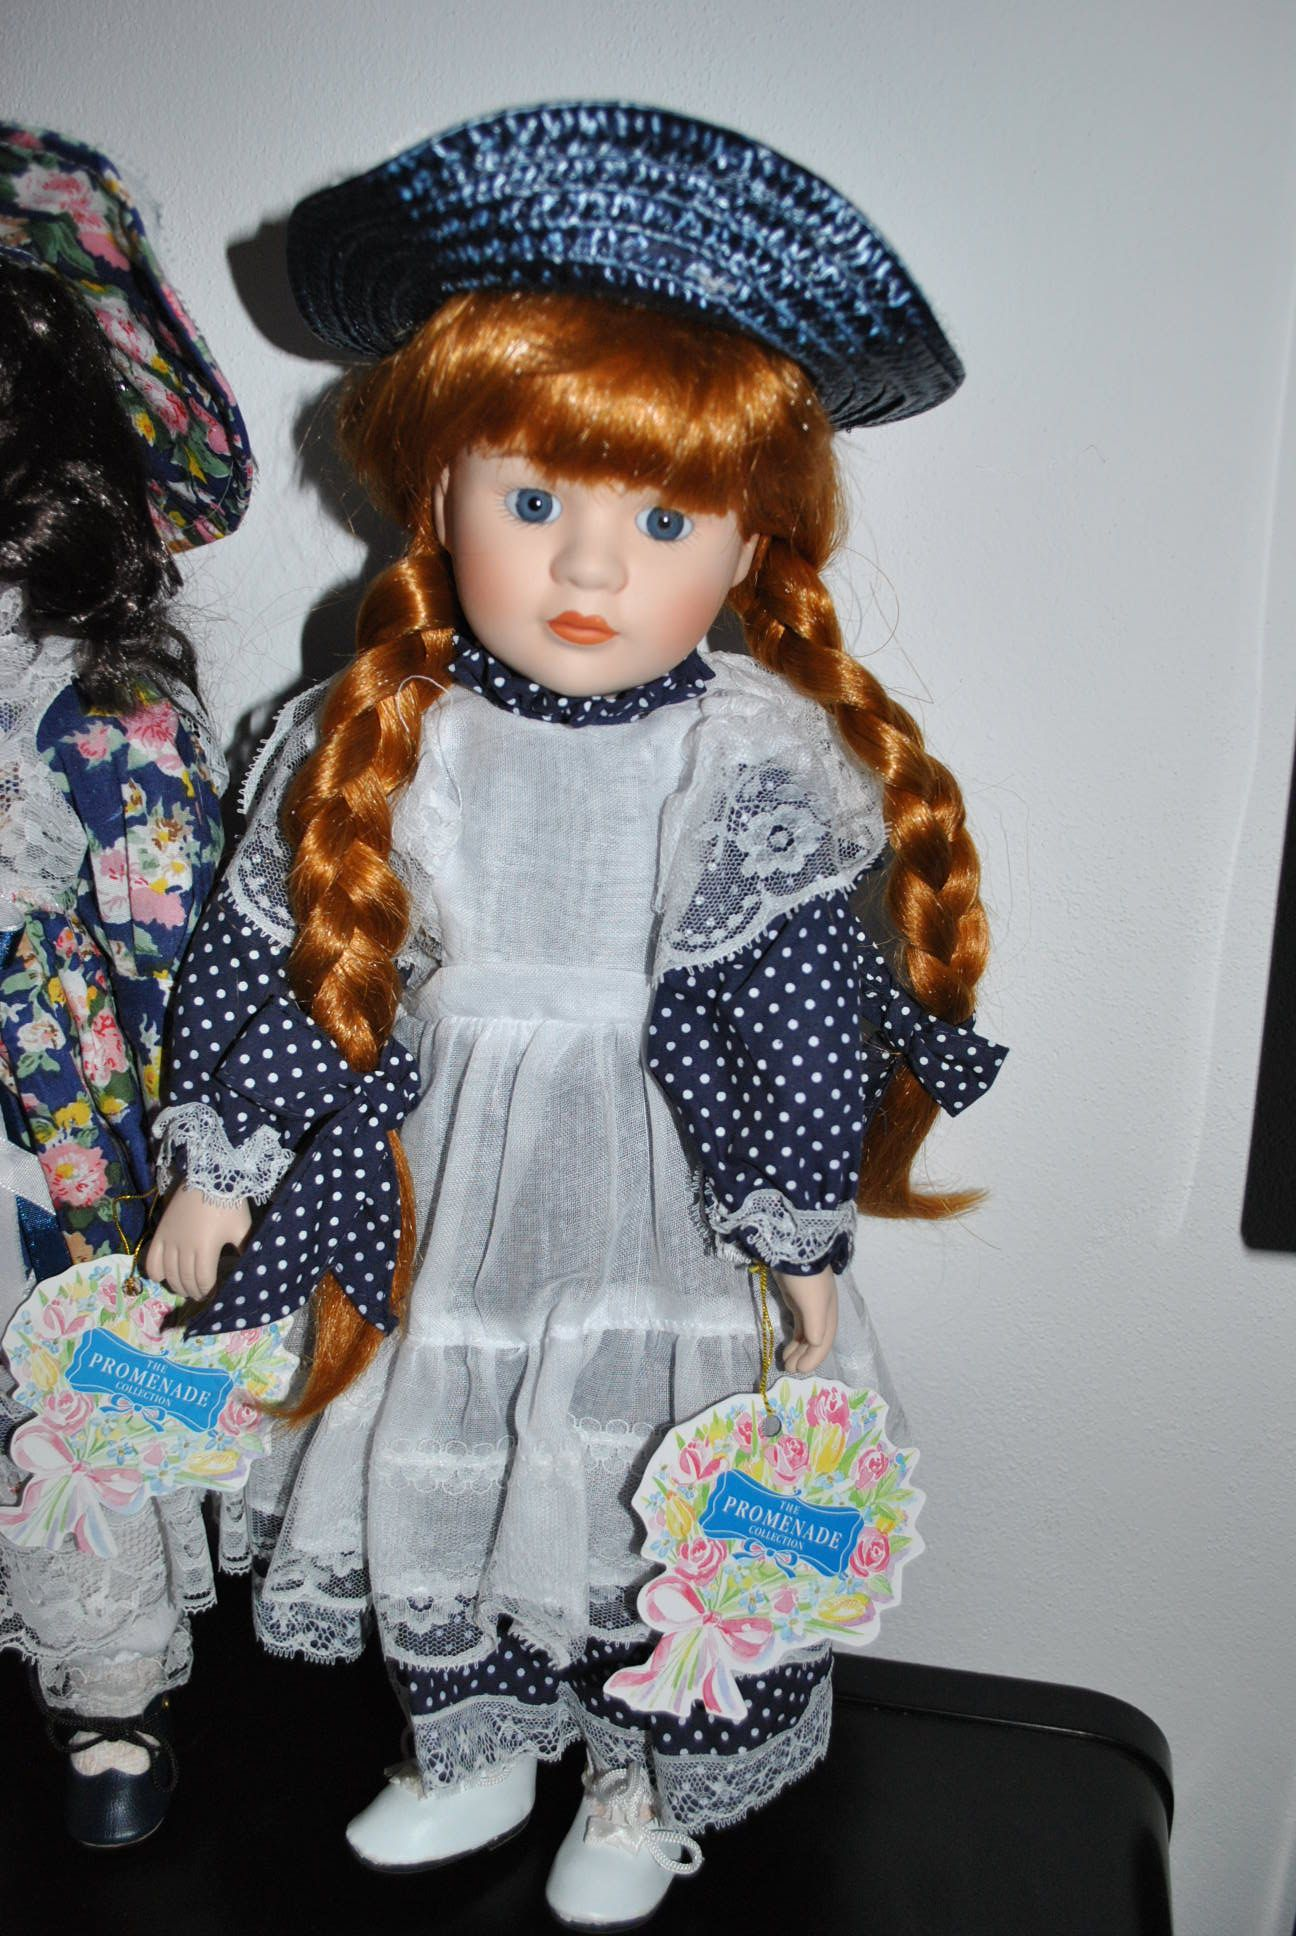 Lalka Lalki Porcelanowa Z Kolekcji Promenade 7385473382 Oficjalne Archiwum Allegro Harajuku Style